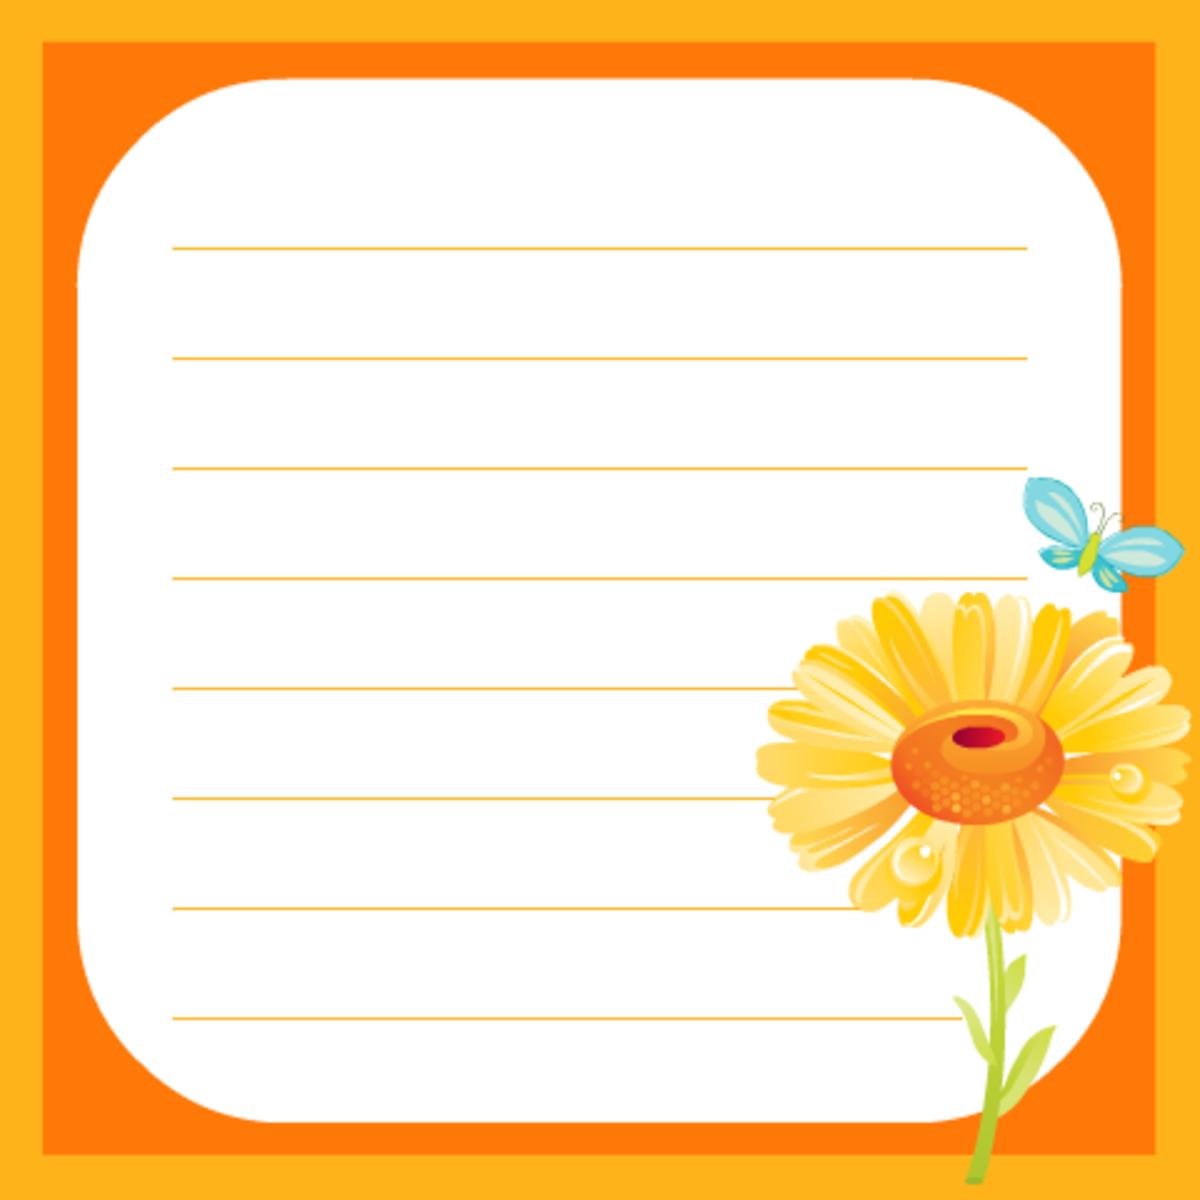 Cheerful sunflower scrapbook journaling card